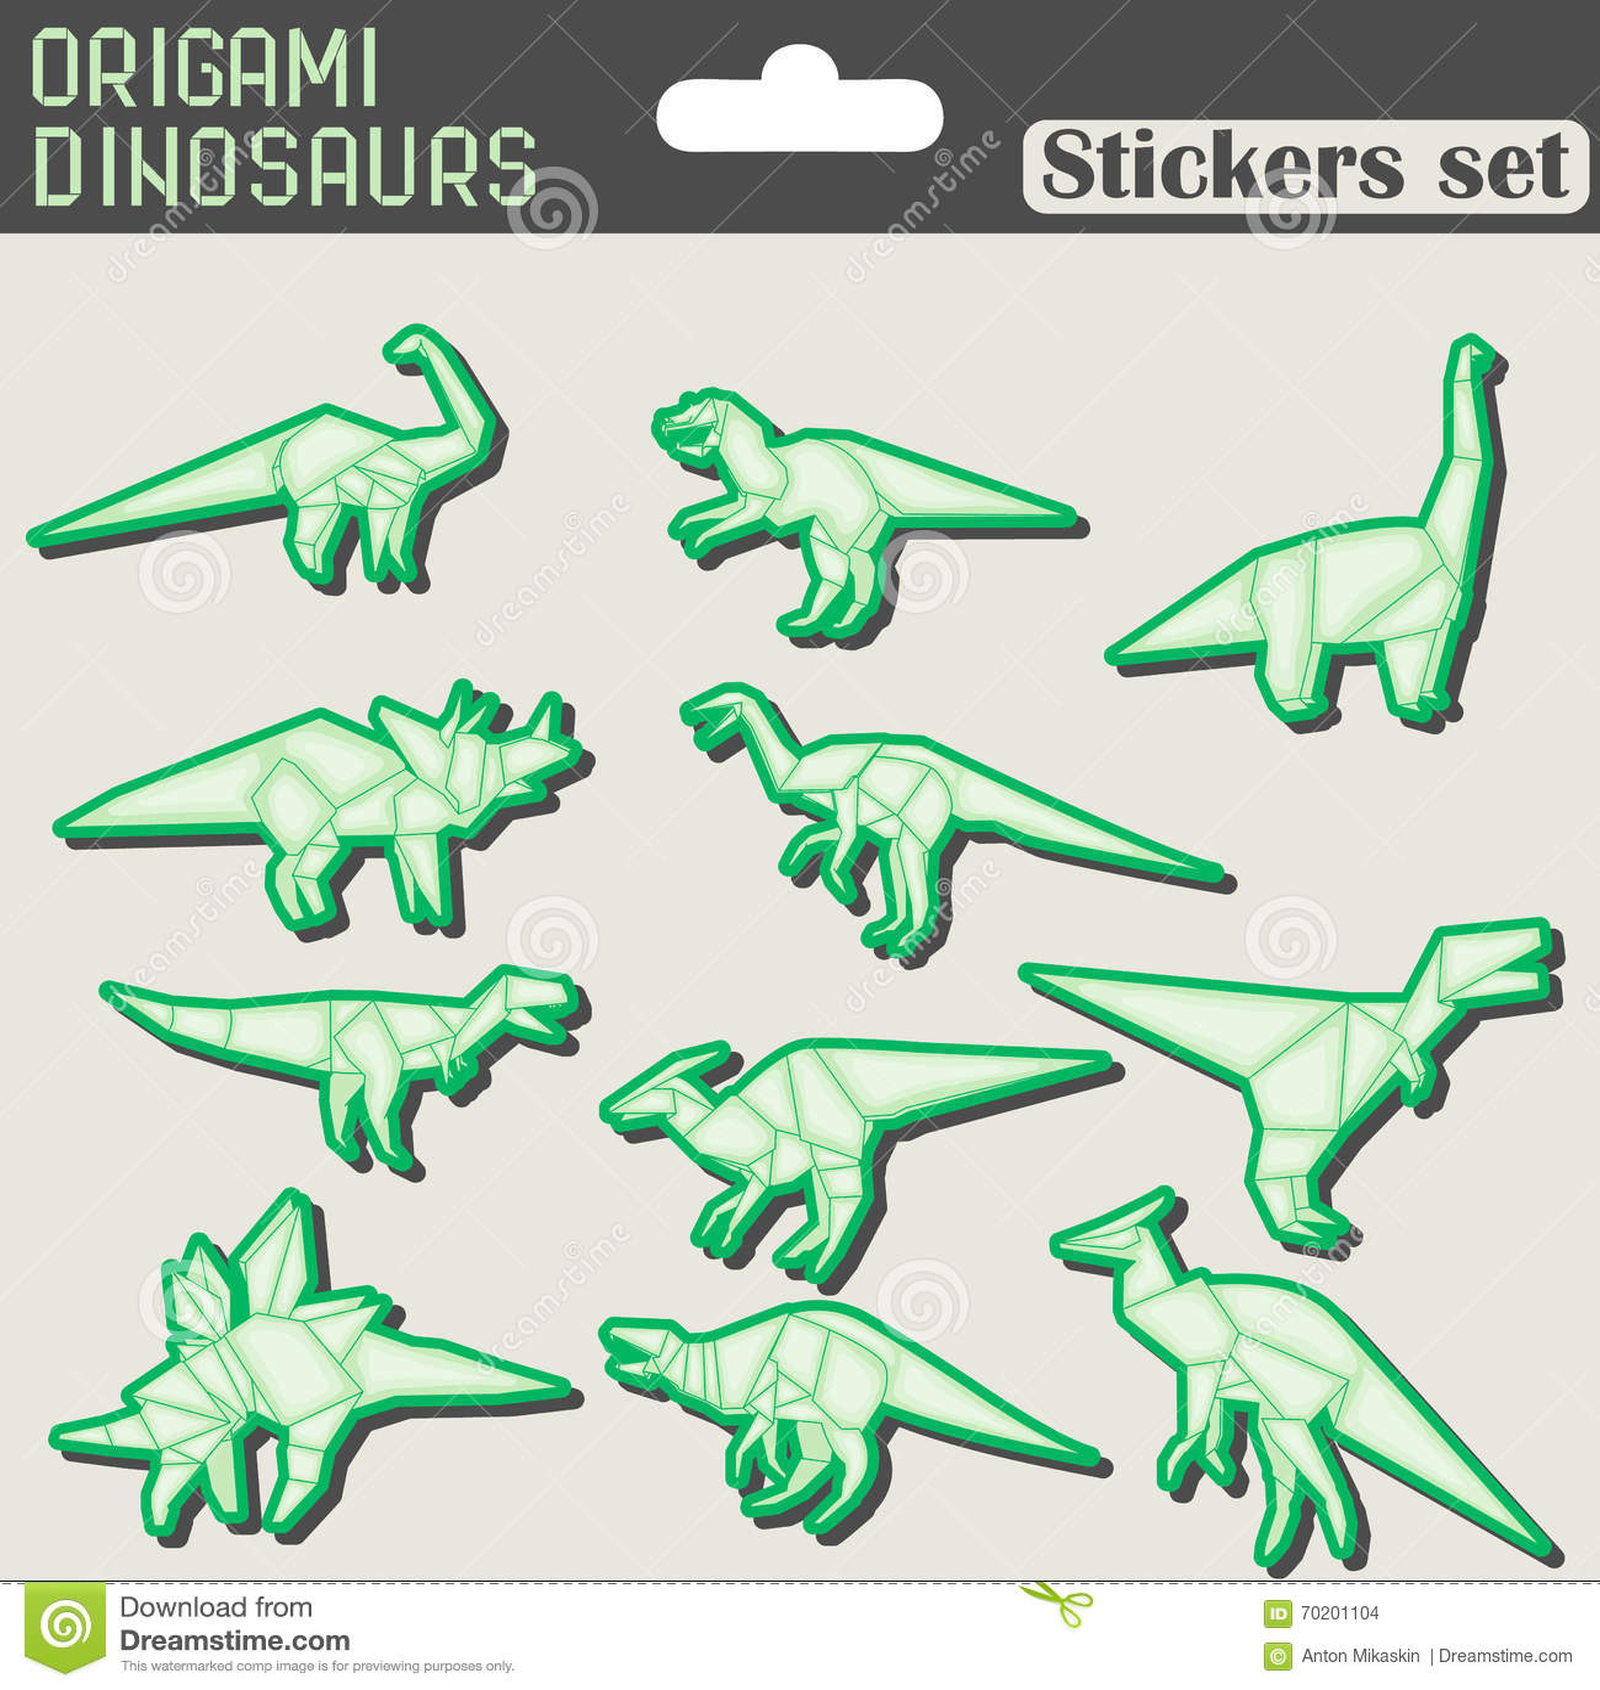 Origami dinosaurs stickers set stock vector illustration of origami dinosaurs stickers set print glue jeuxipadfo Choice Image